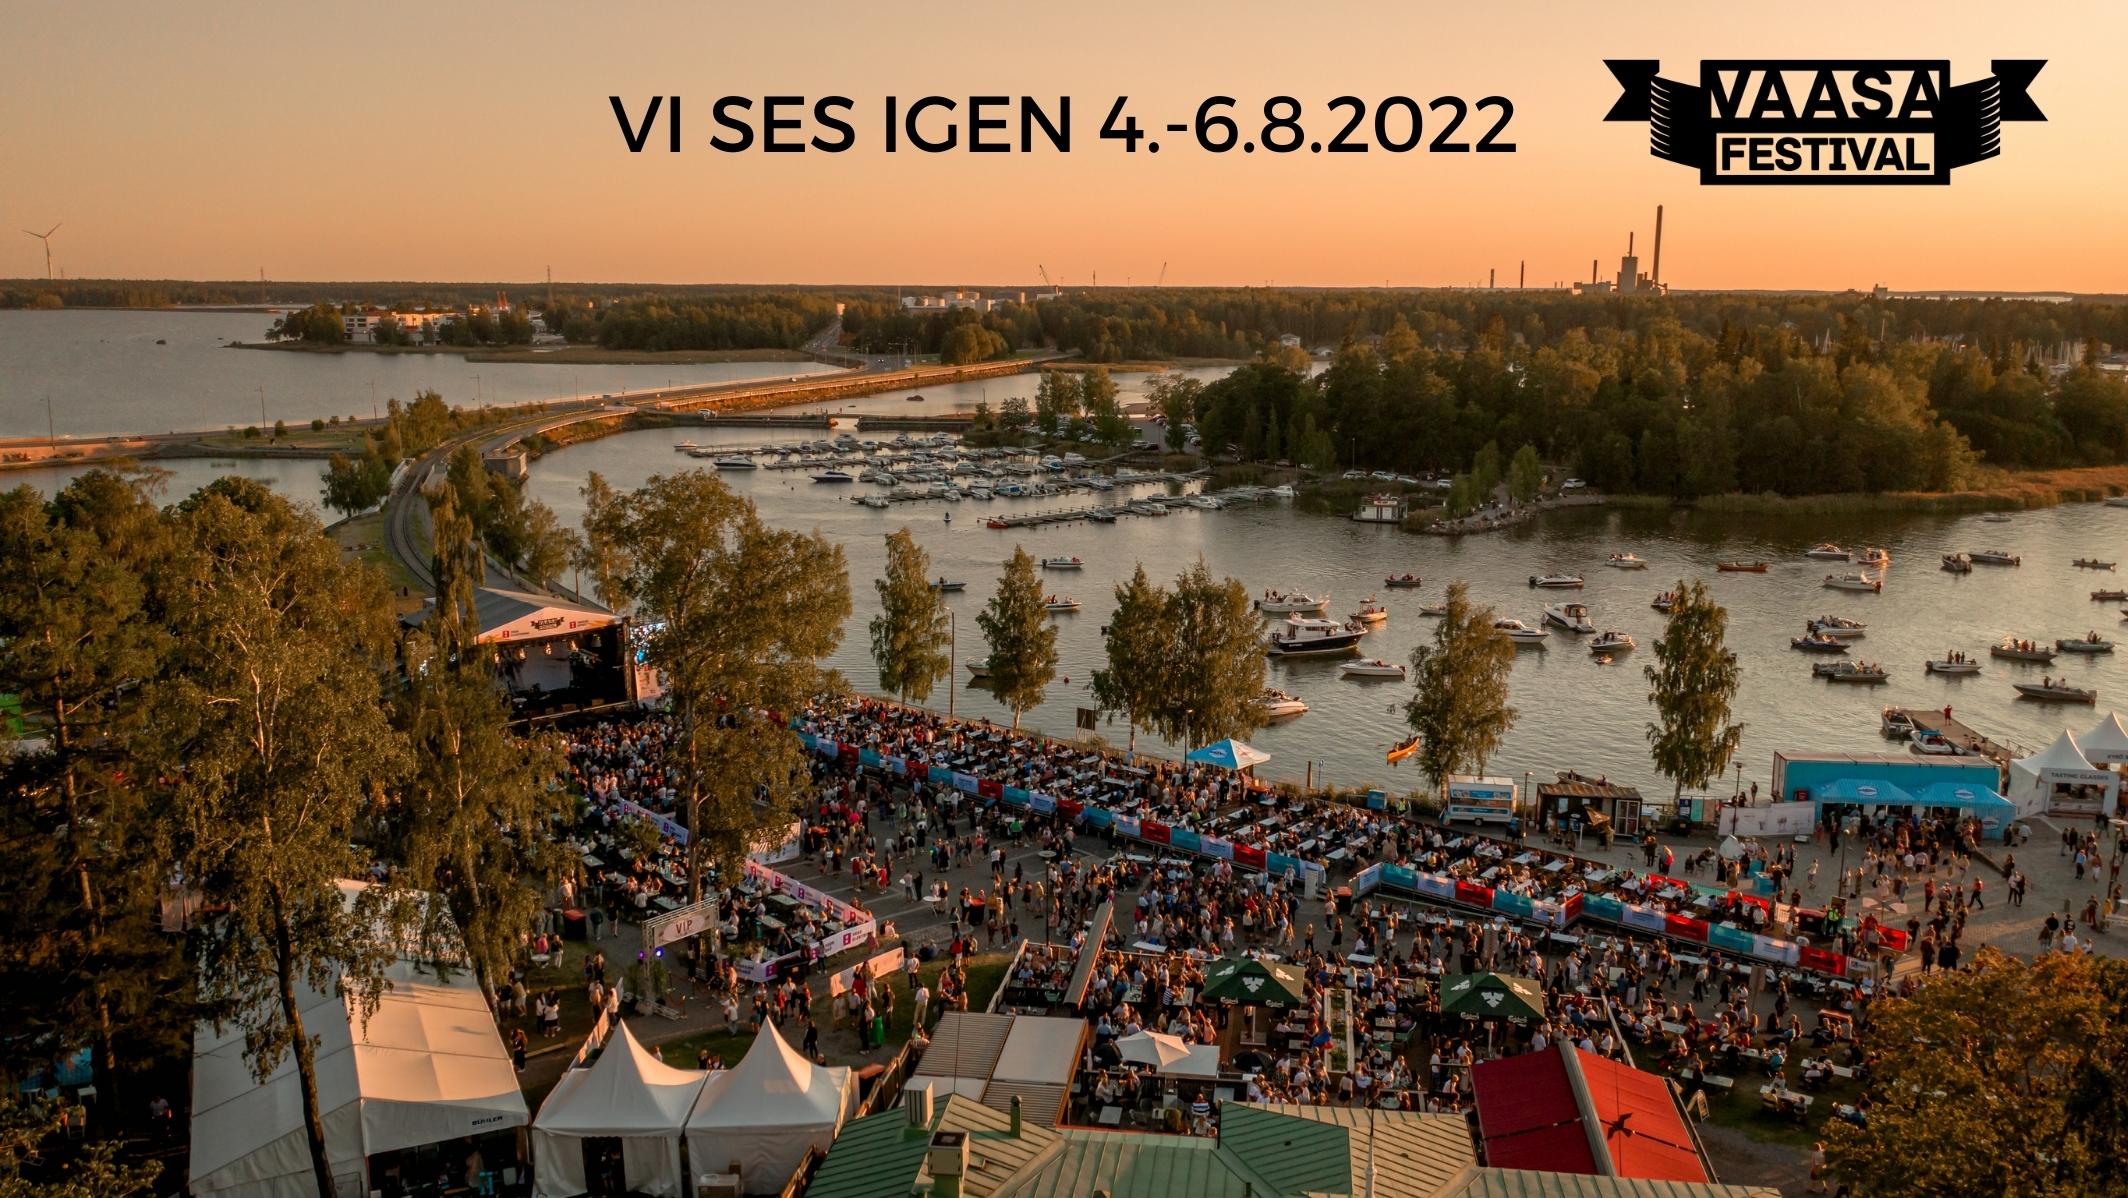 Vaasa Festival 2022 - vi ses igen